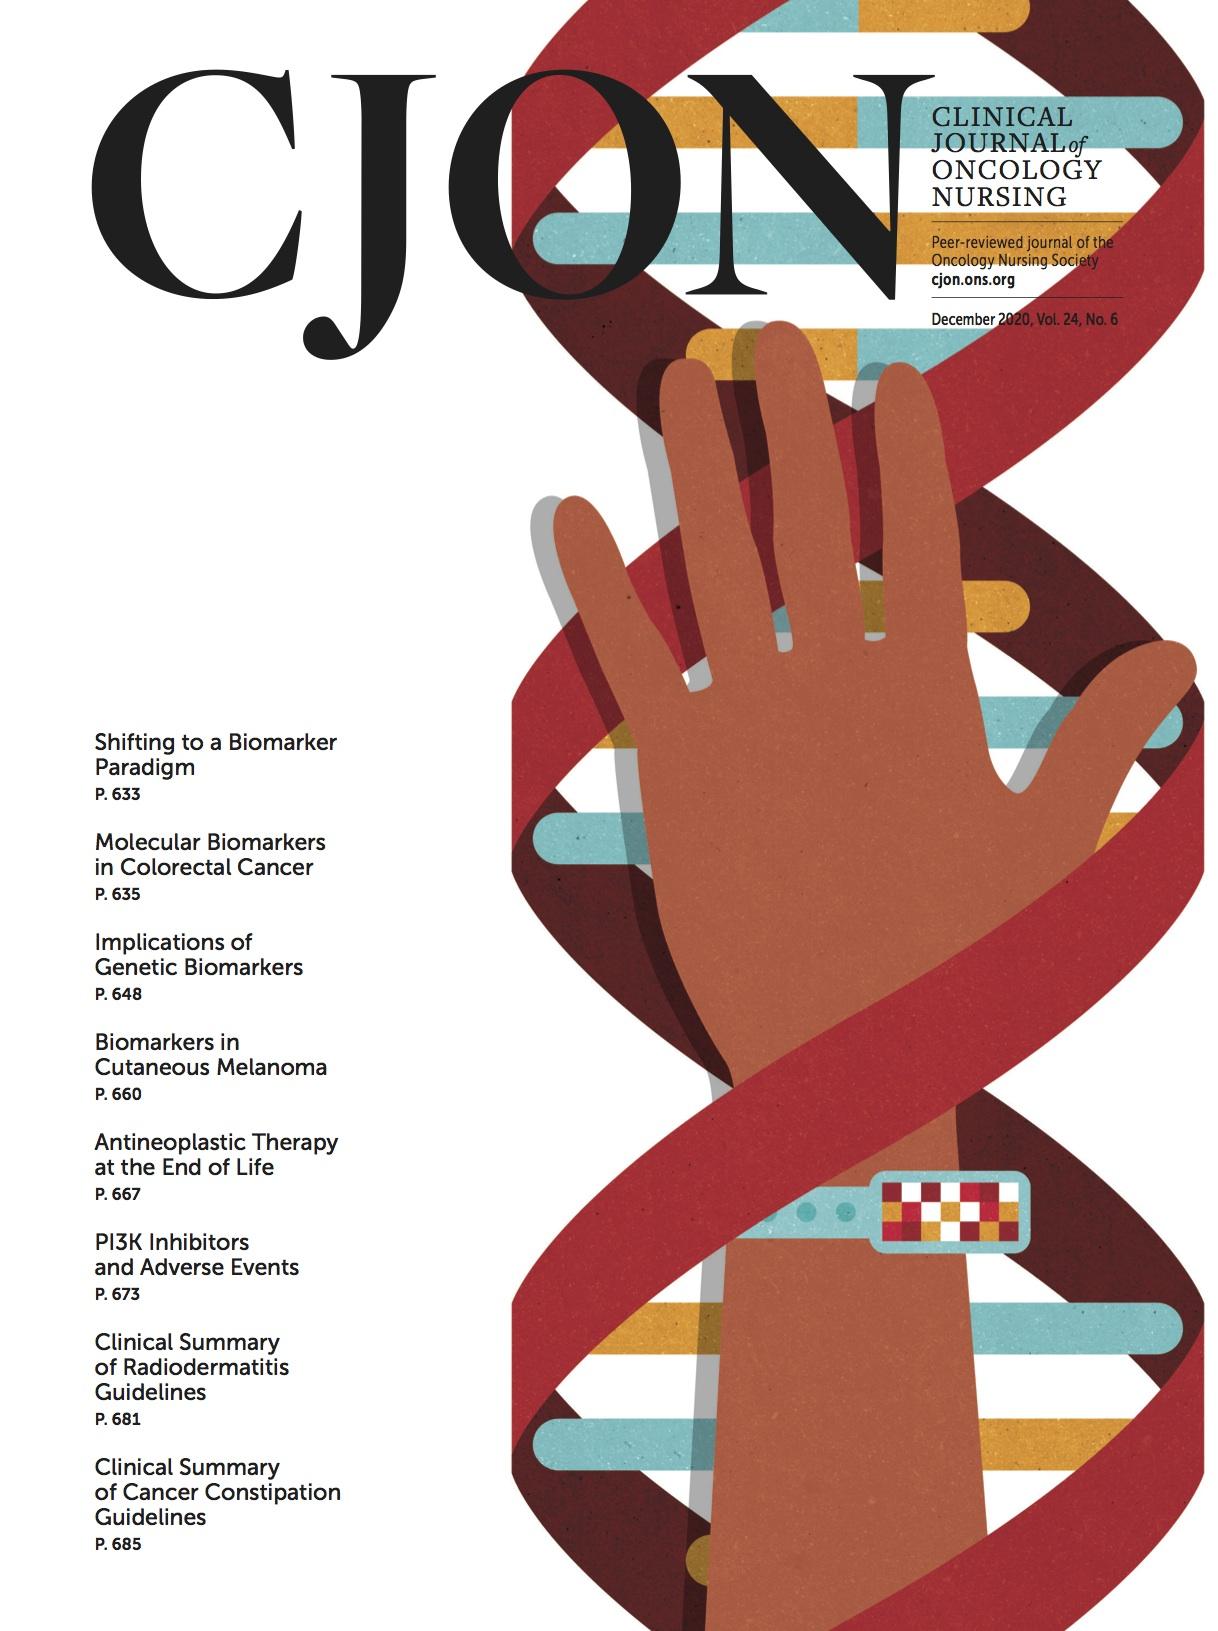 Theispot Com Kotryna Zukauskaite Illustrates The Biomarker Paradigm